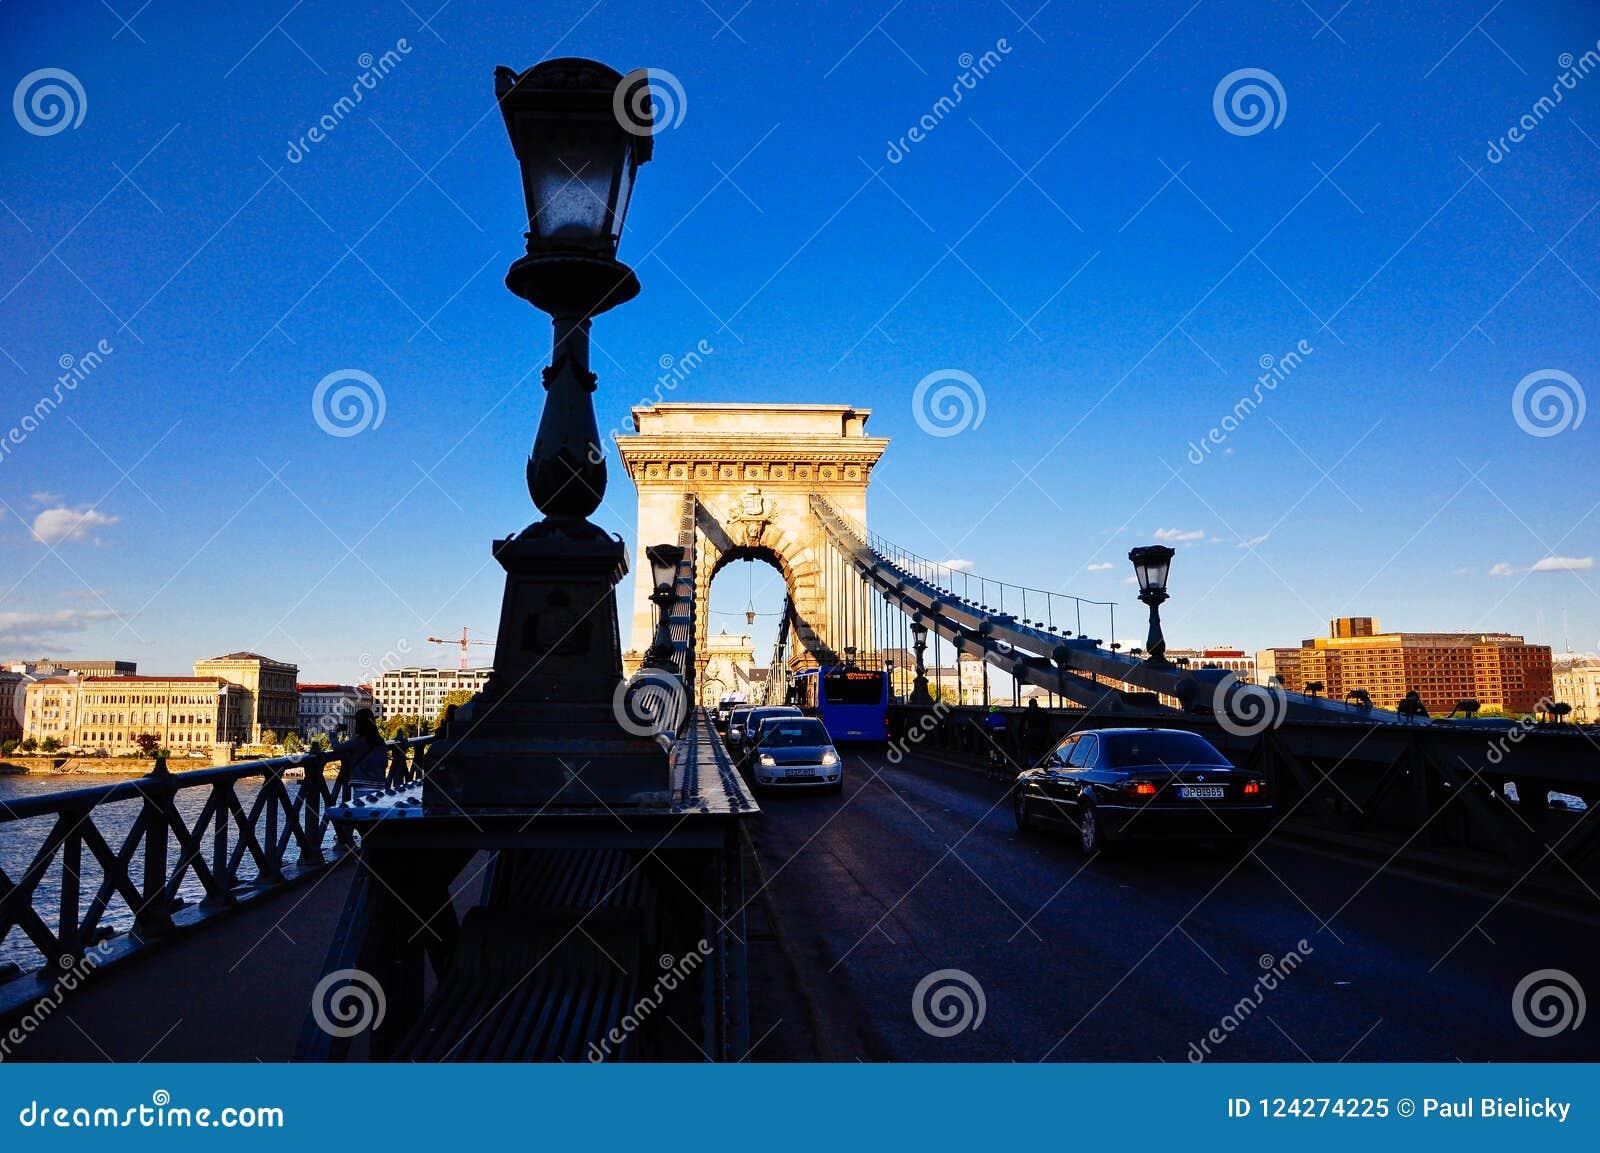 The Széchenyi Chain Bridge in Budapest, Hungary.